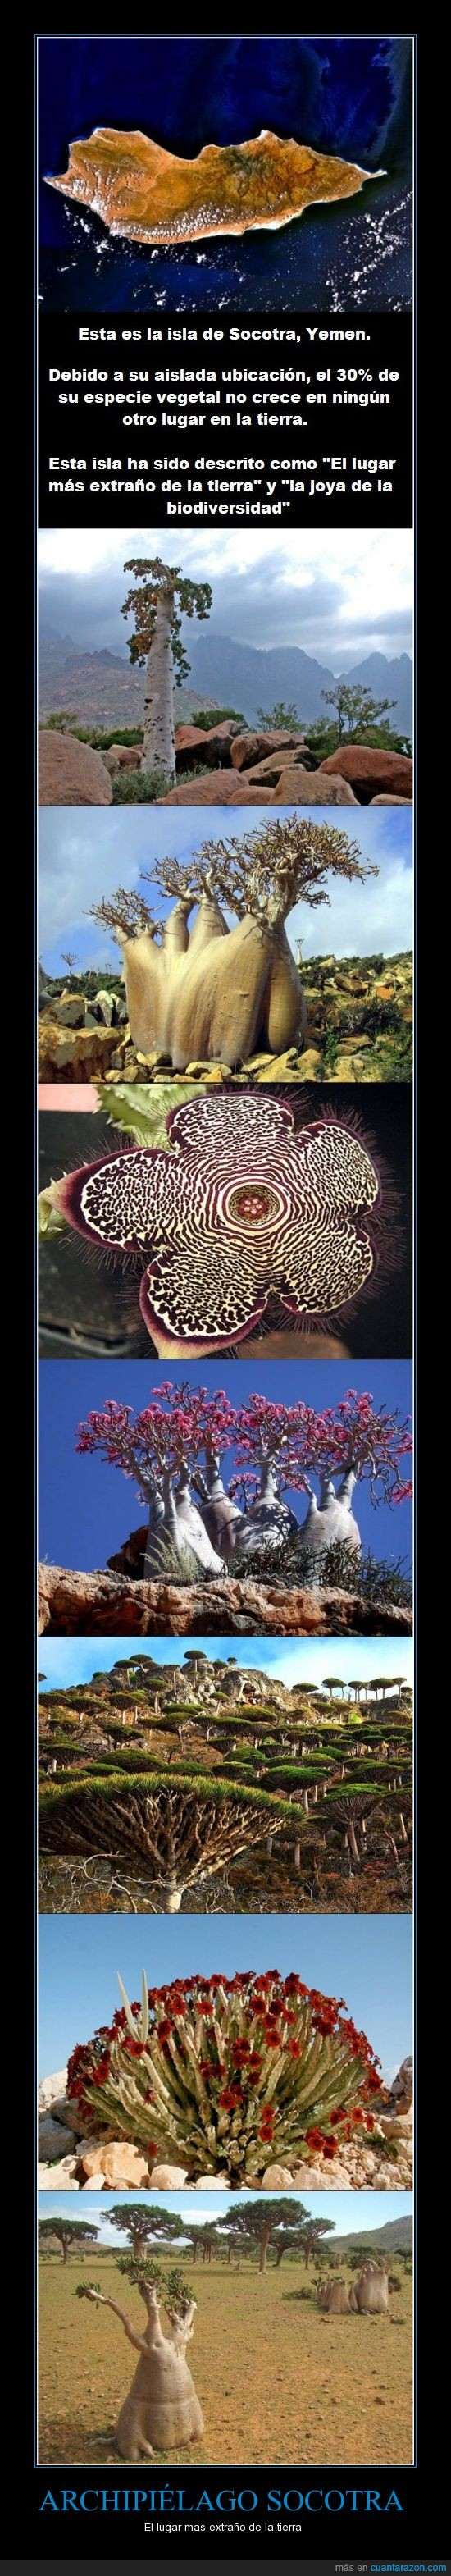 archipiélago,extraño,isla,Tim Burton vive ahí,vegetales extraños